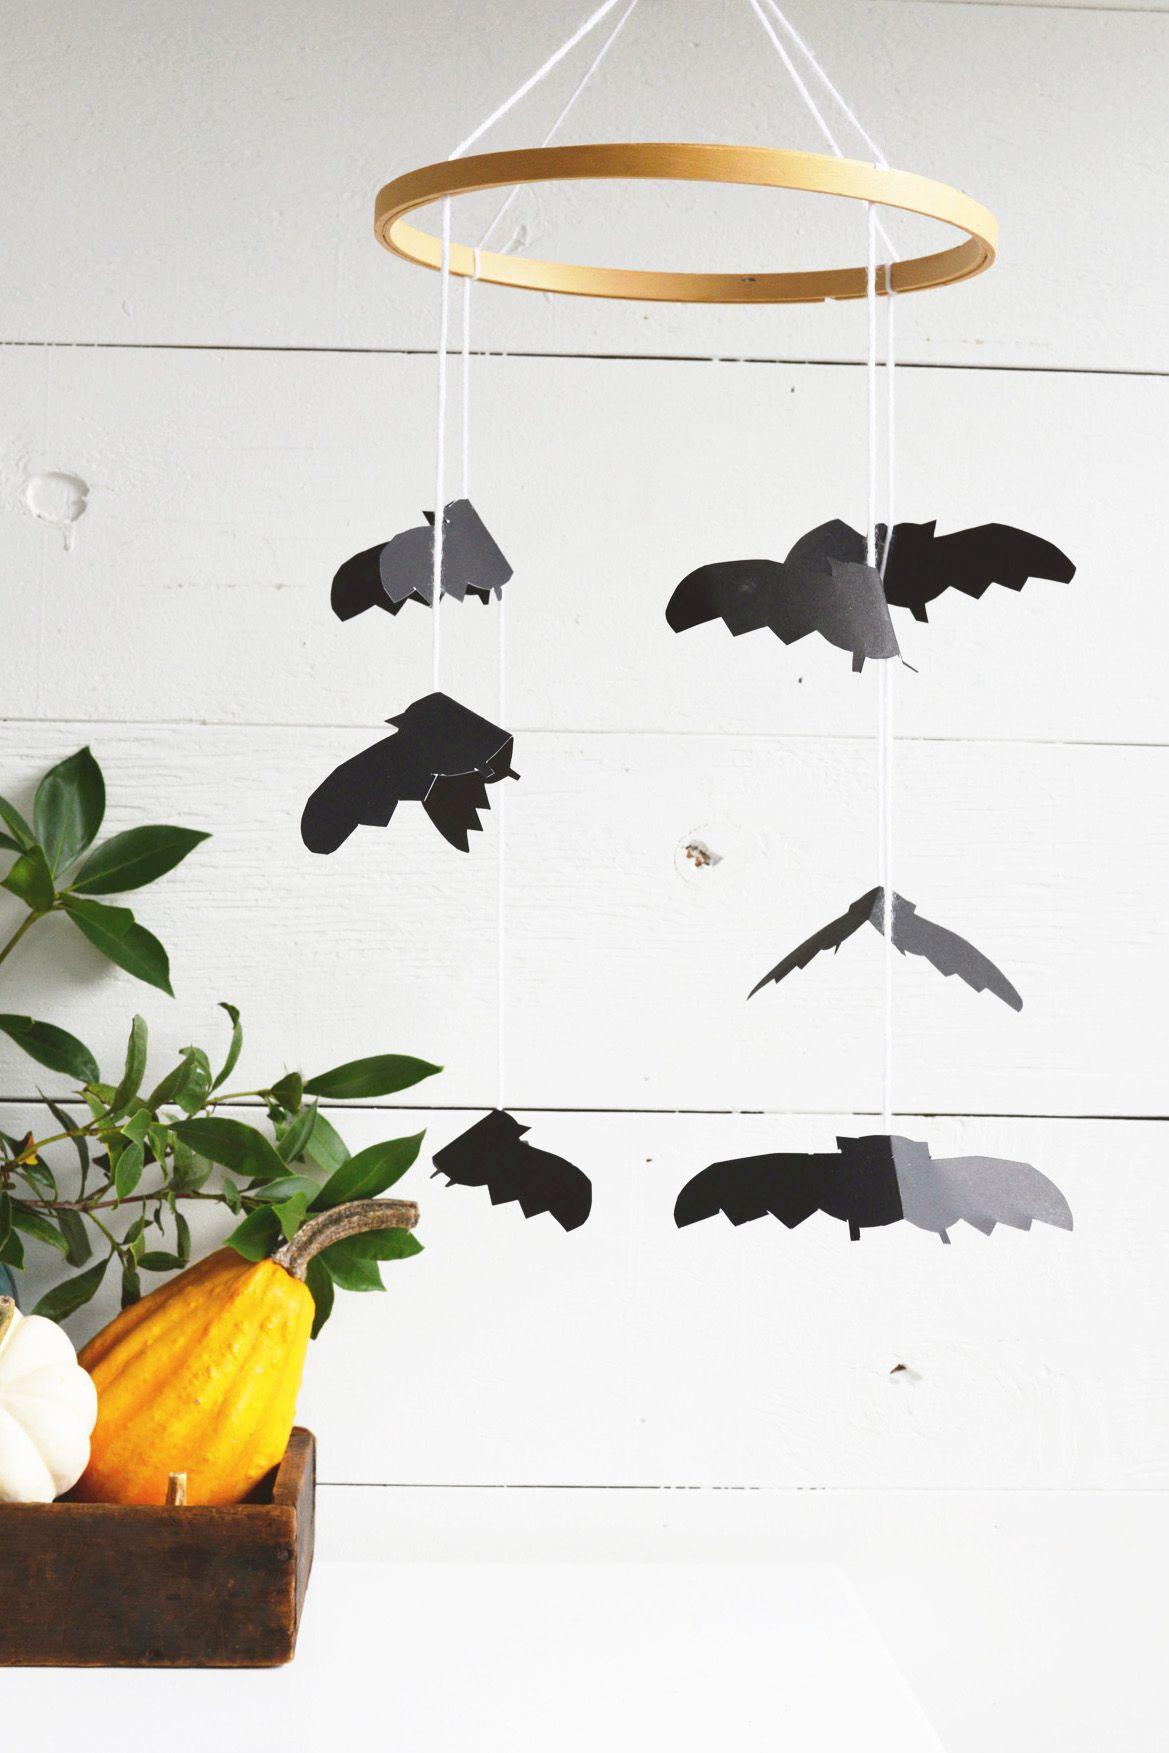 Embroidery Hoop Halloween-themed bat mobile